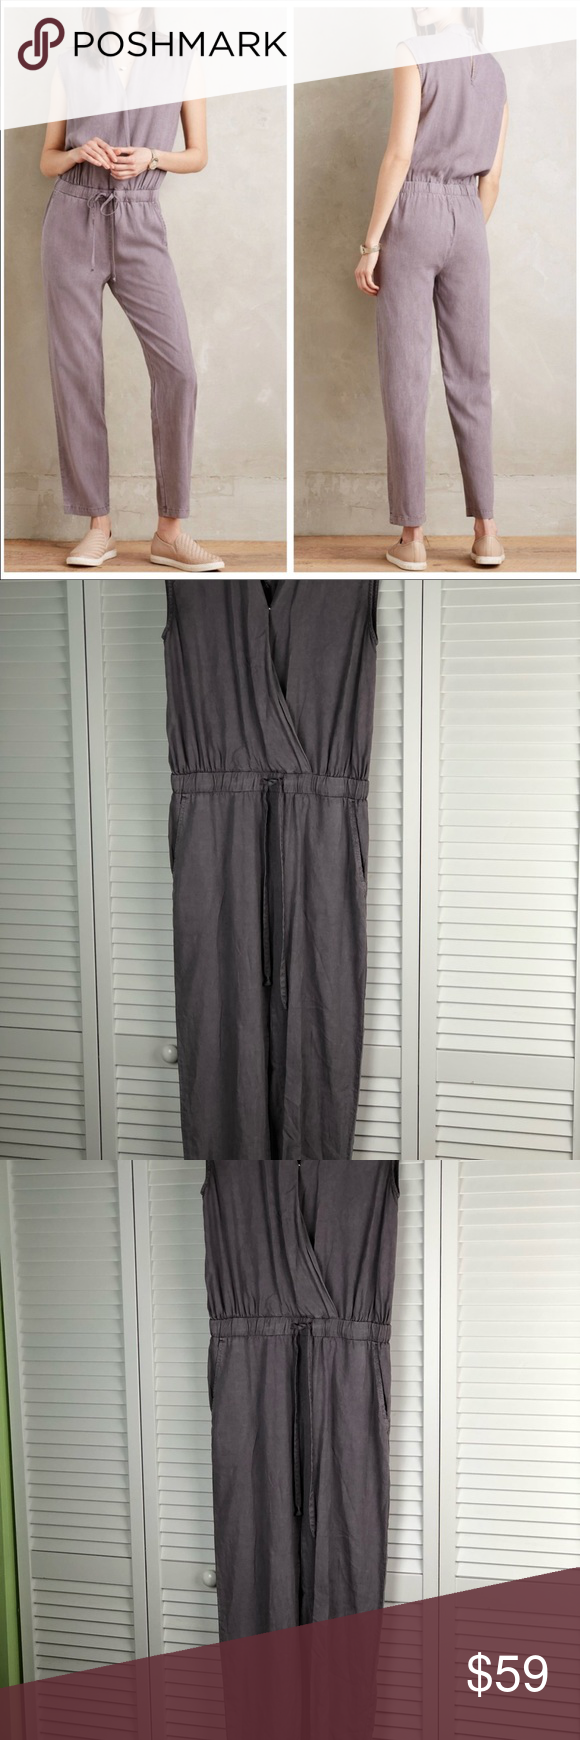 88f2e22b66c Anthropologie Cloth   Stone Mignon Jumpsuit XS Purple